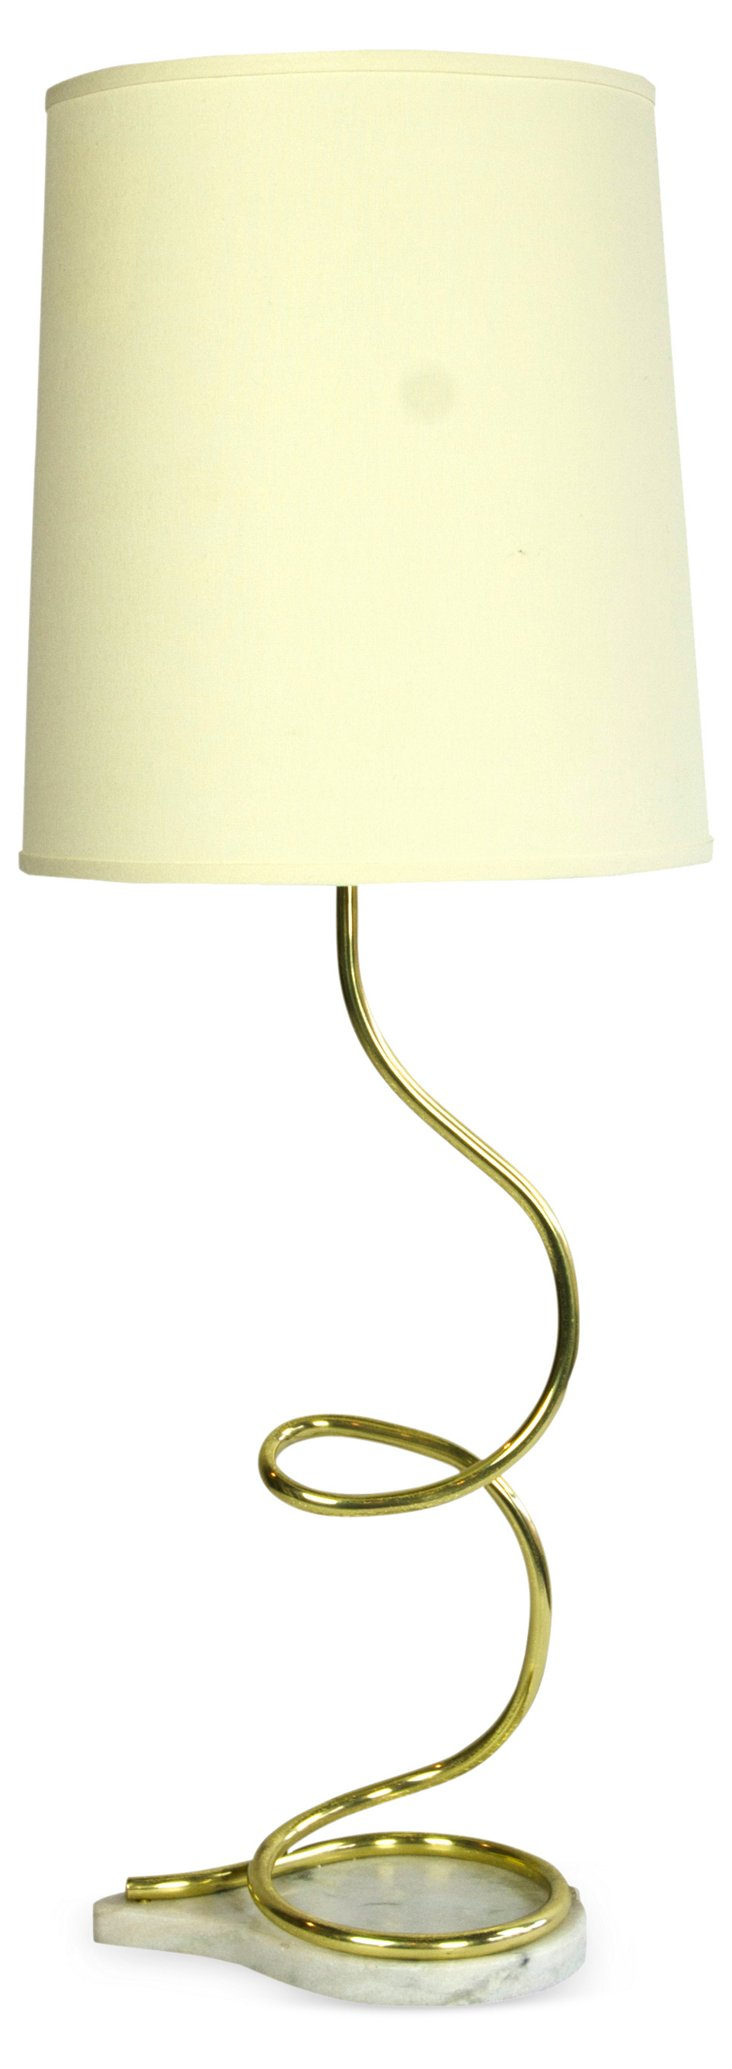 Contemporary Spiral Brass Lamp